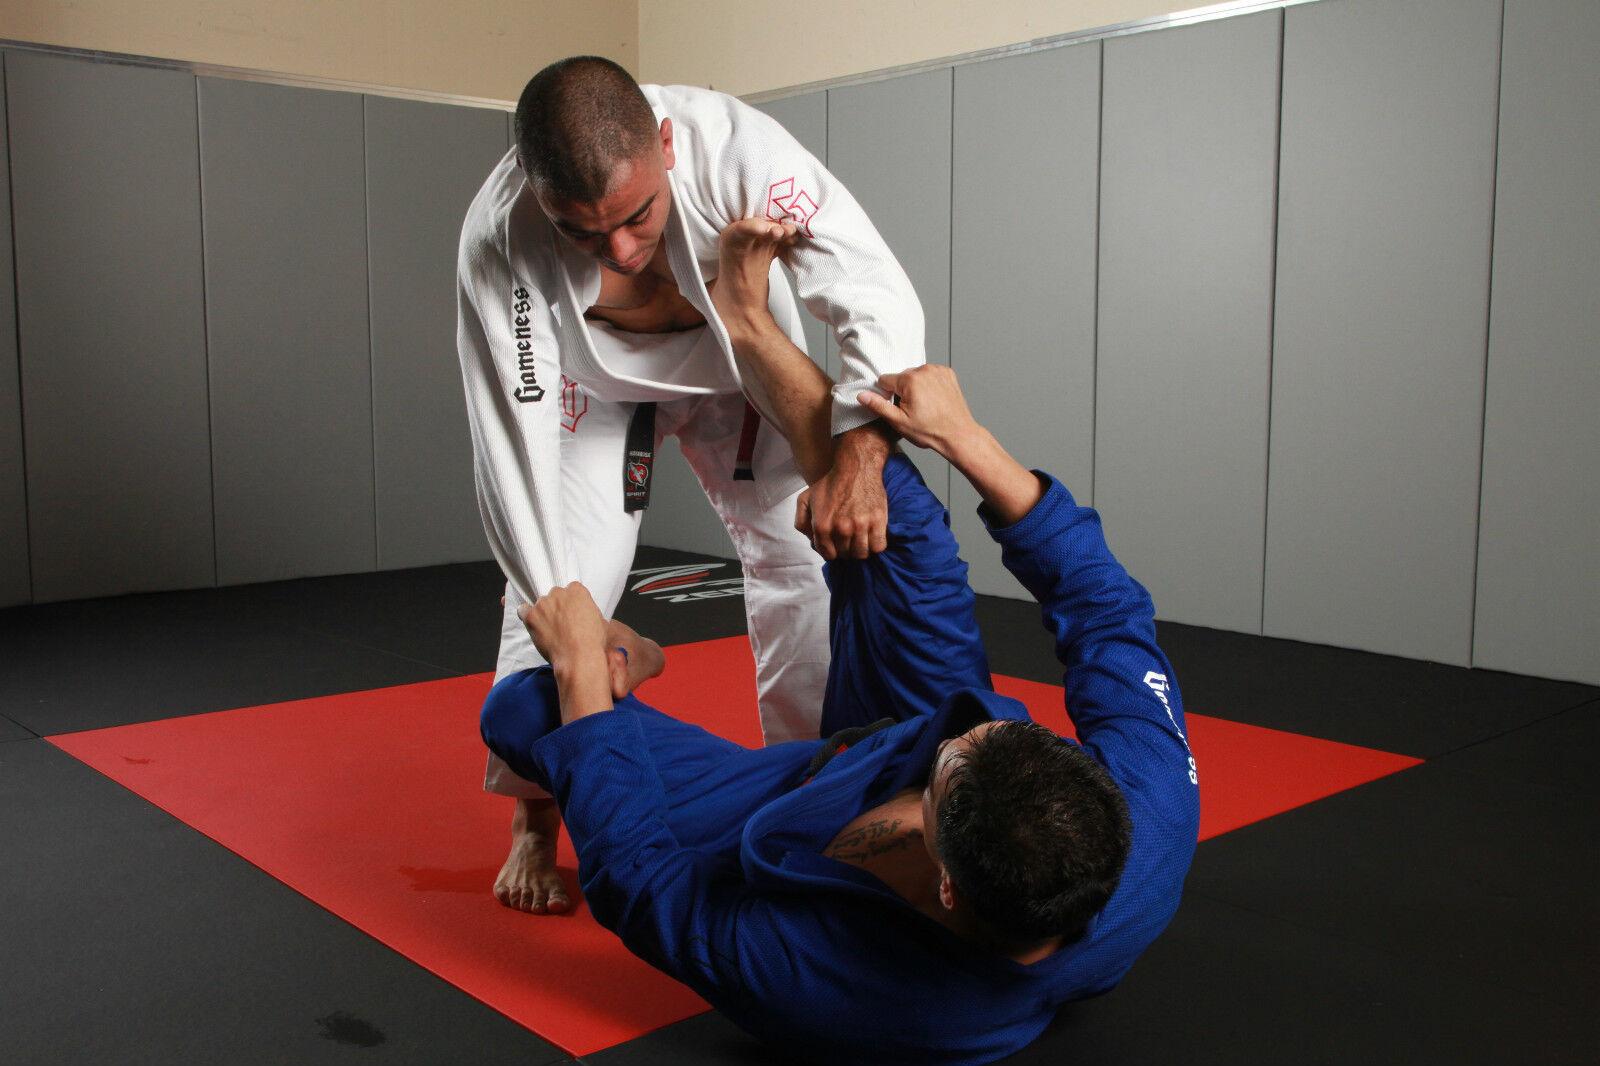 Gameness Air Kids BJJ GI Blue G1302 Kimono Uniform Brazilian Jiu Jitsu